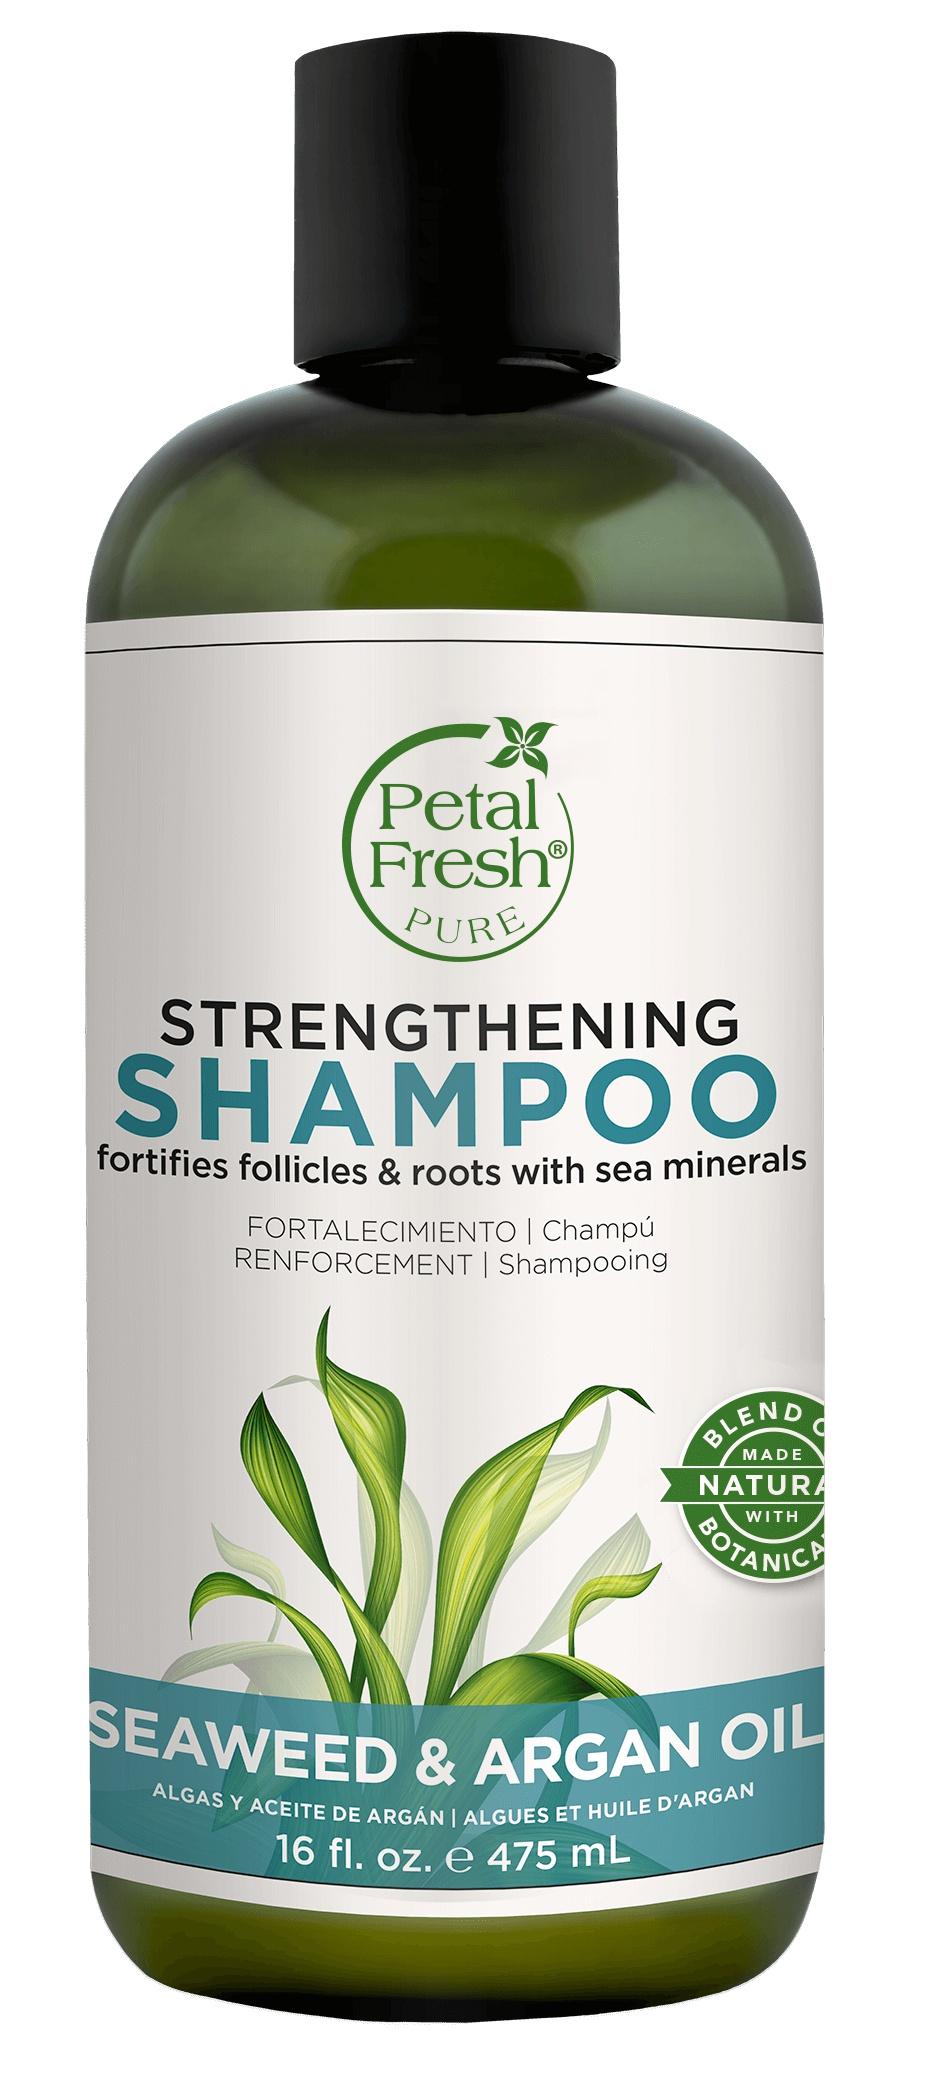 Petal Fresh Seaweed & Argan Shampoo